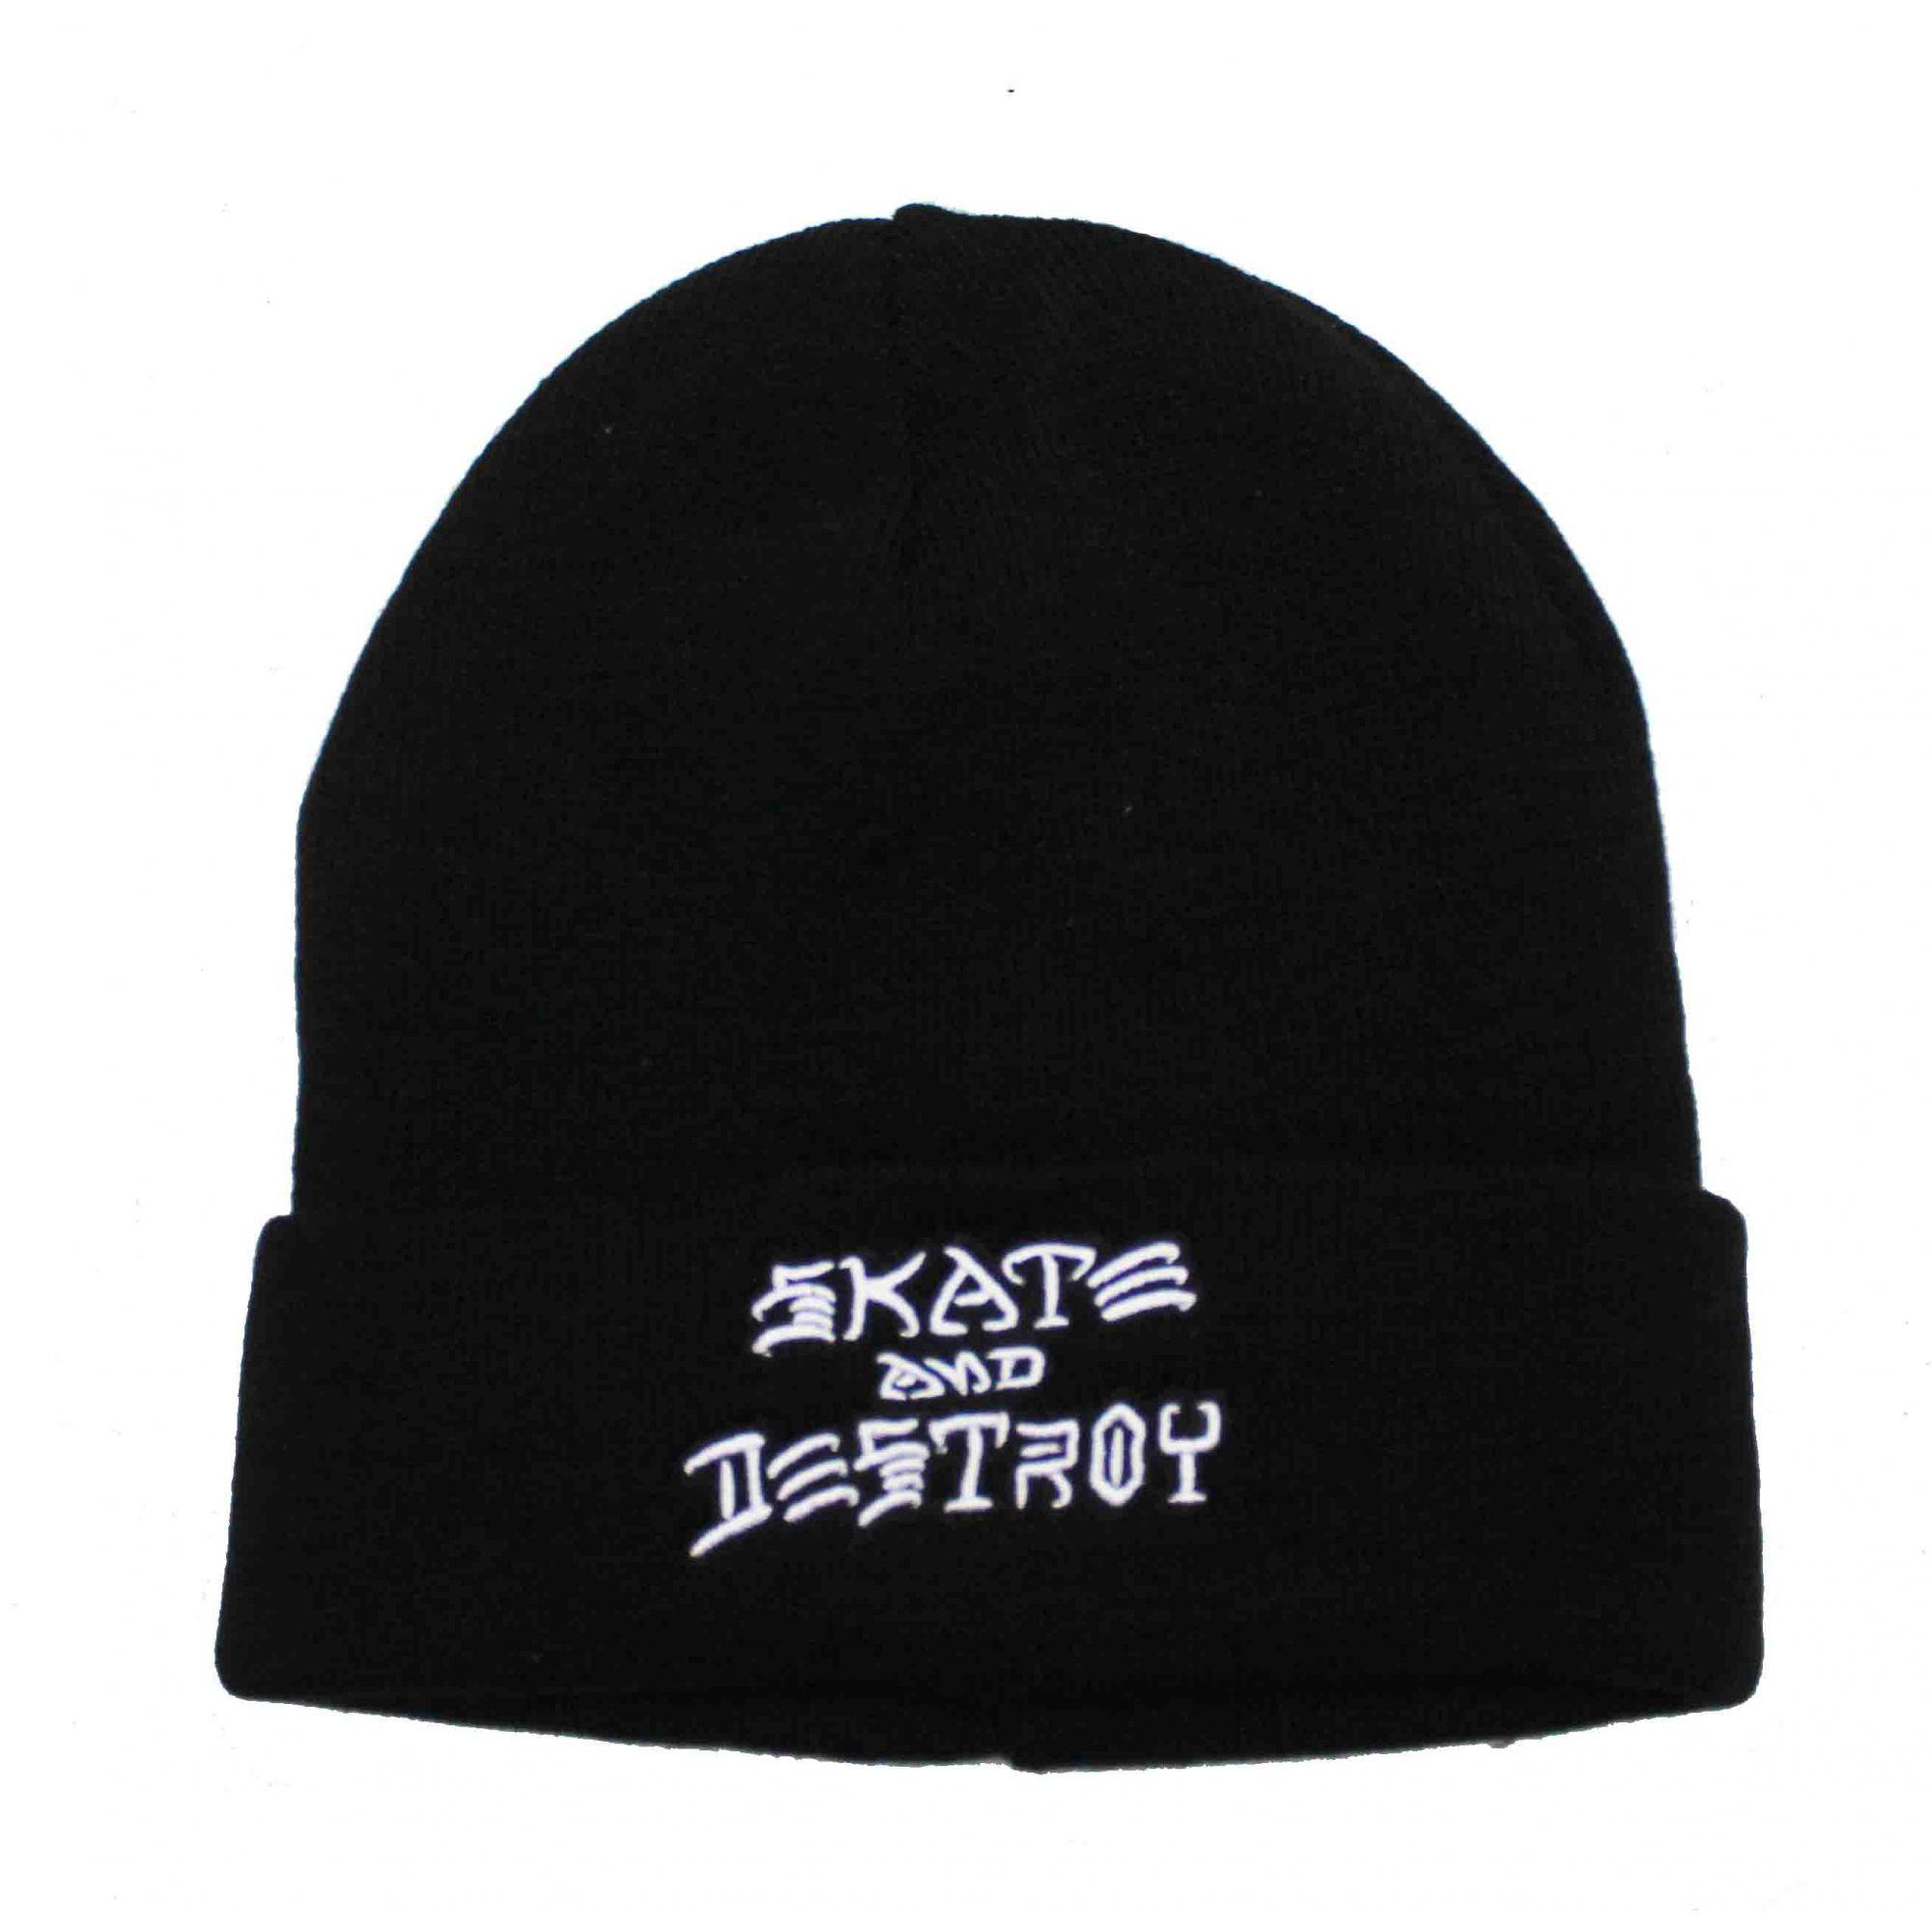 Touca Thrasher Magazine Skate and Destroy  Embroidery Preto